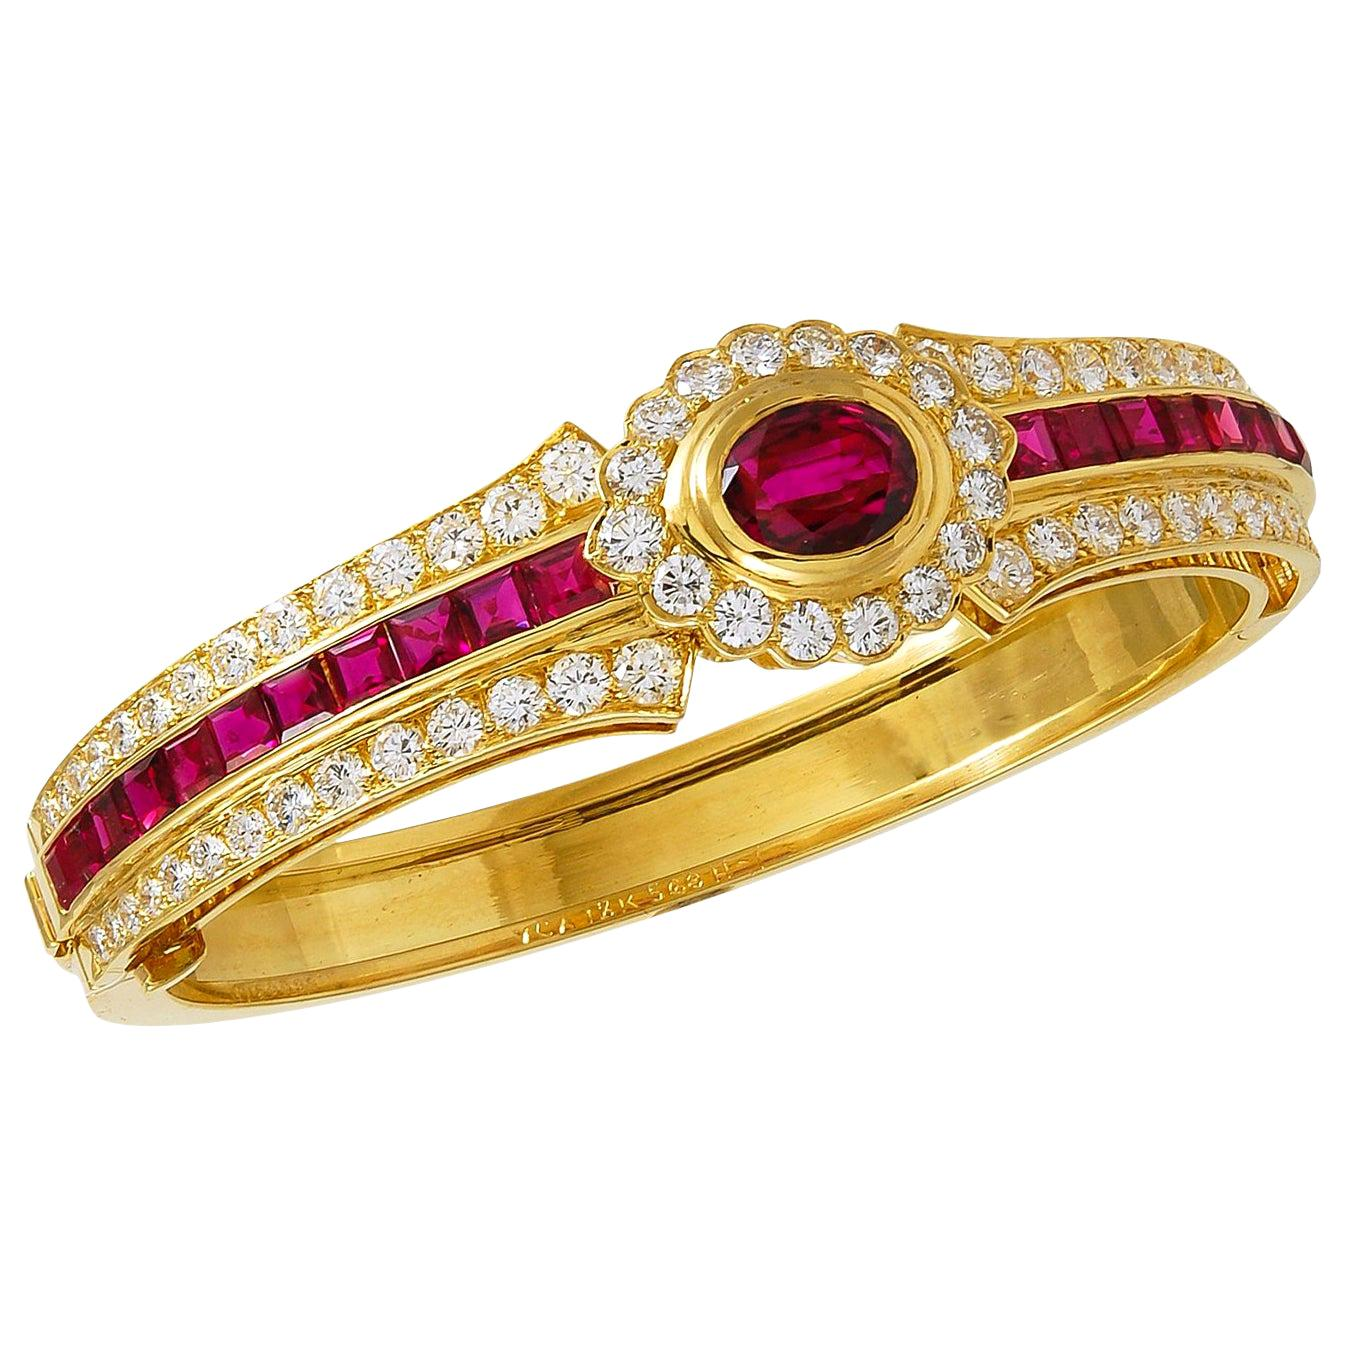 Van Cleef & Arpels Diamond Ruby Yellow Gold Bangle Bracelet